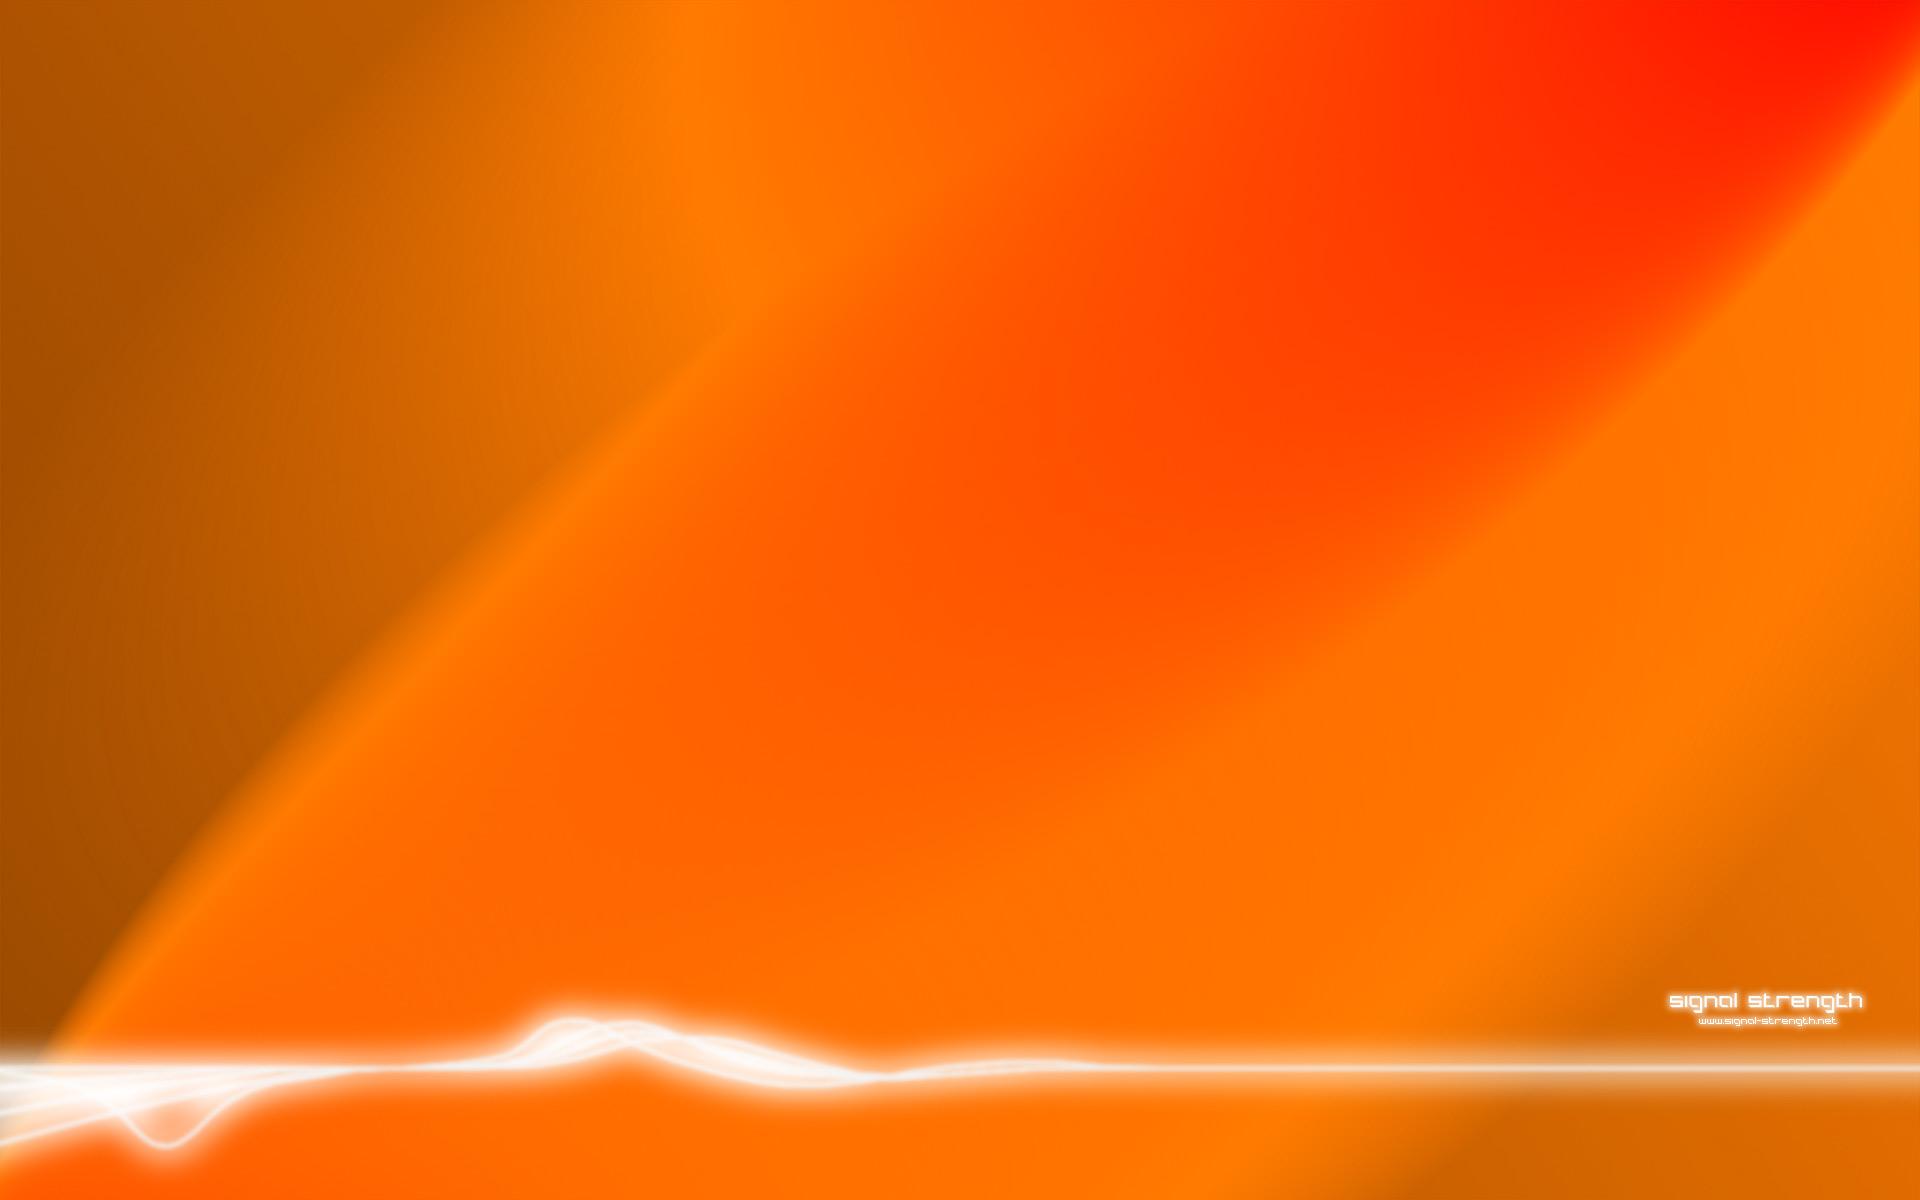 orange wave wallpaper - photo #1